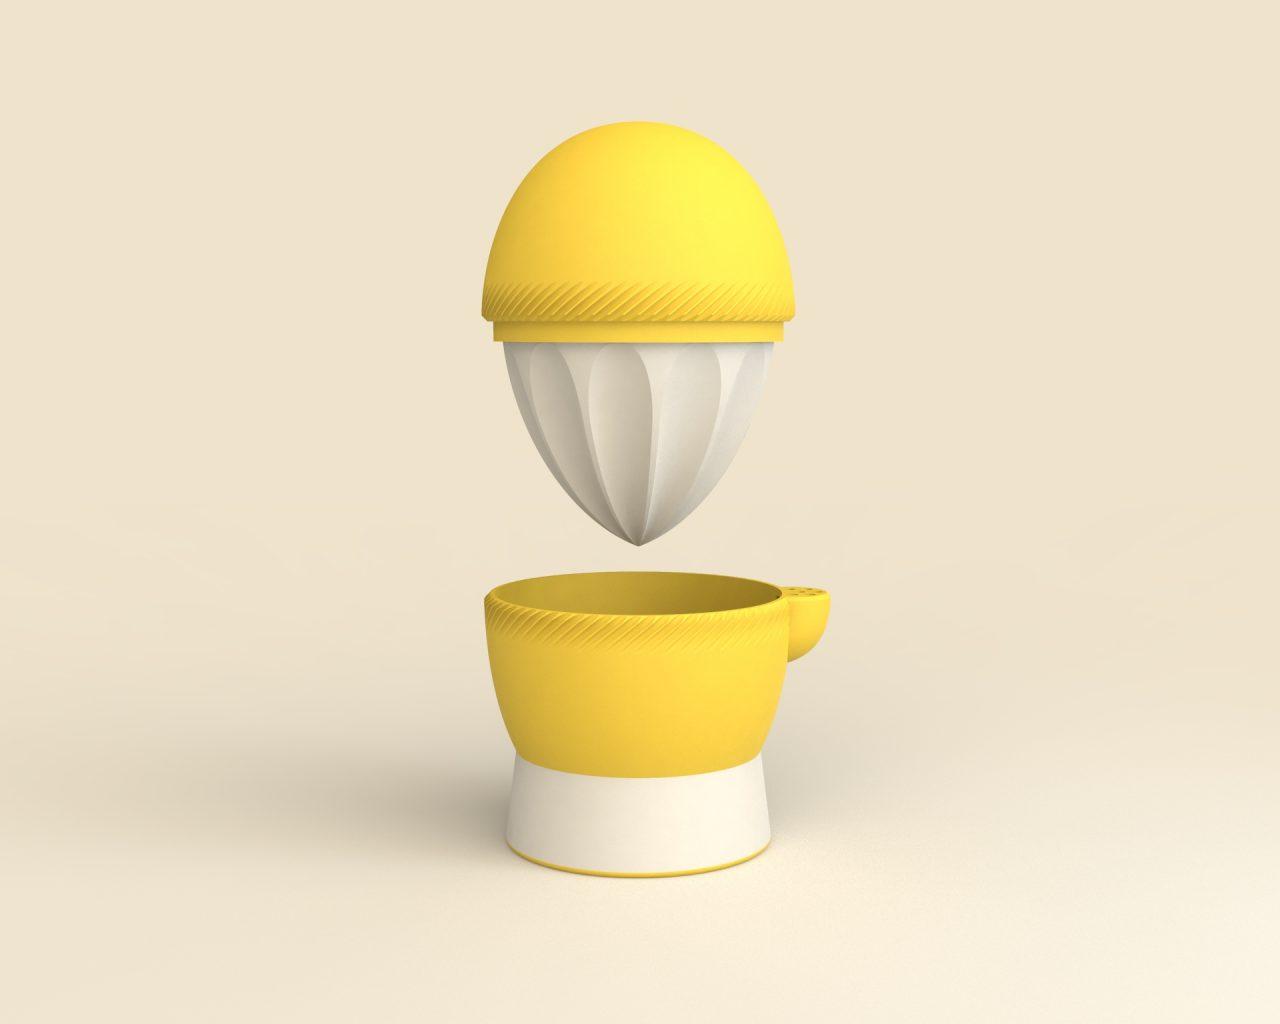 Rendered image of Lemi the Lemon Squeezer.